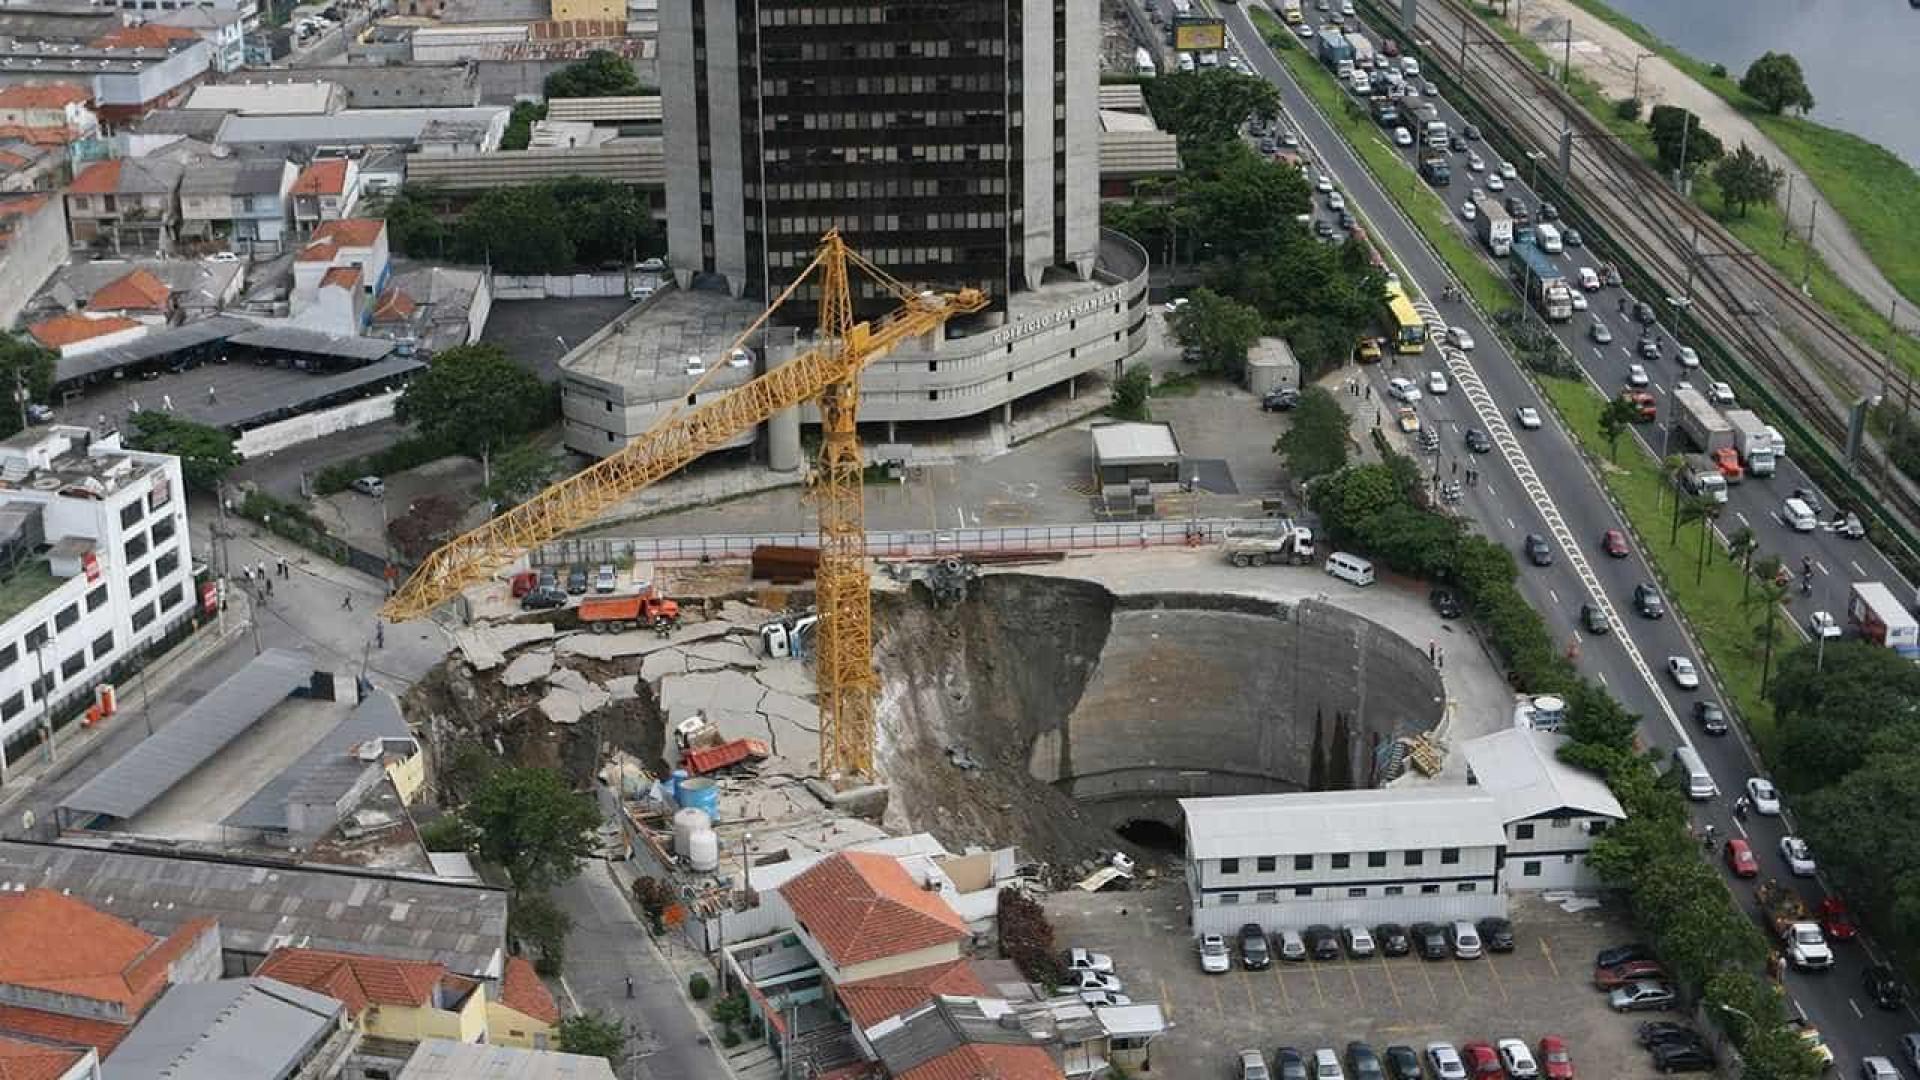 Justiça inocenta 14 acusados por cratera que matou sete no metrô-SP